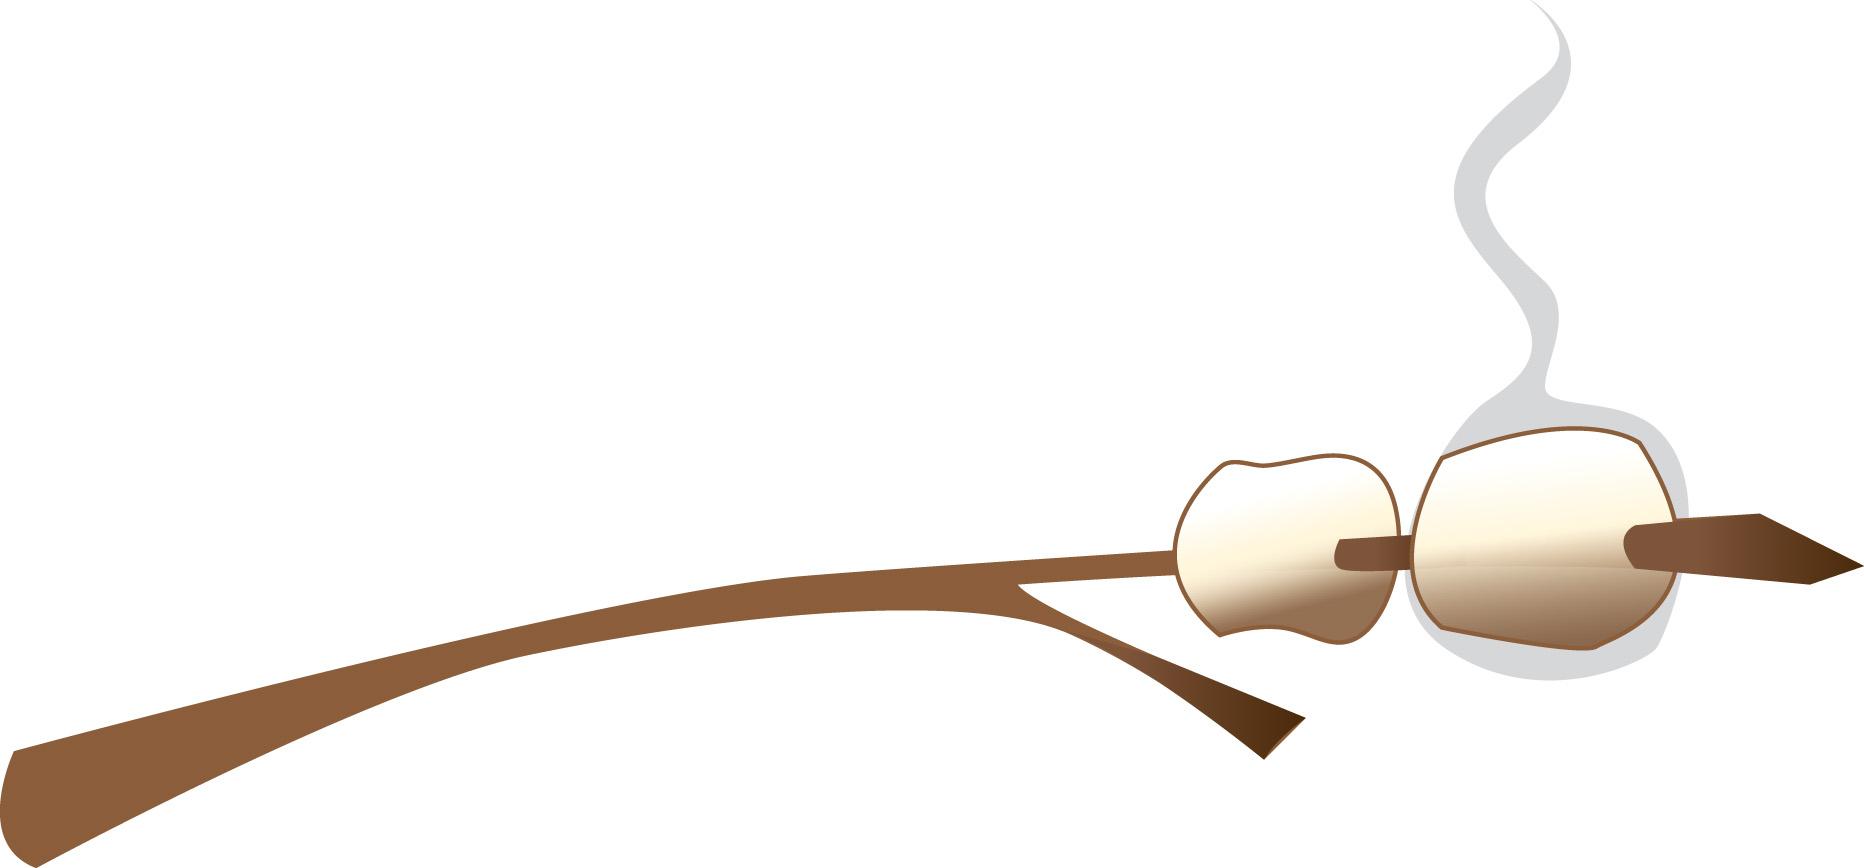 Clip Art Marshmallow Clipart marshmallow clip art clipart best tumundografico